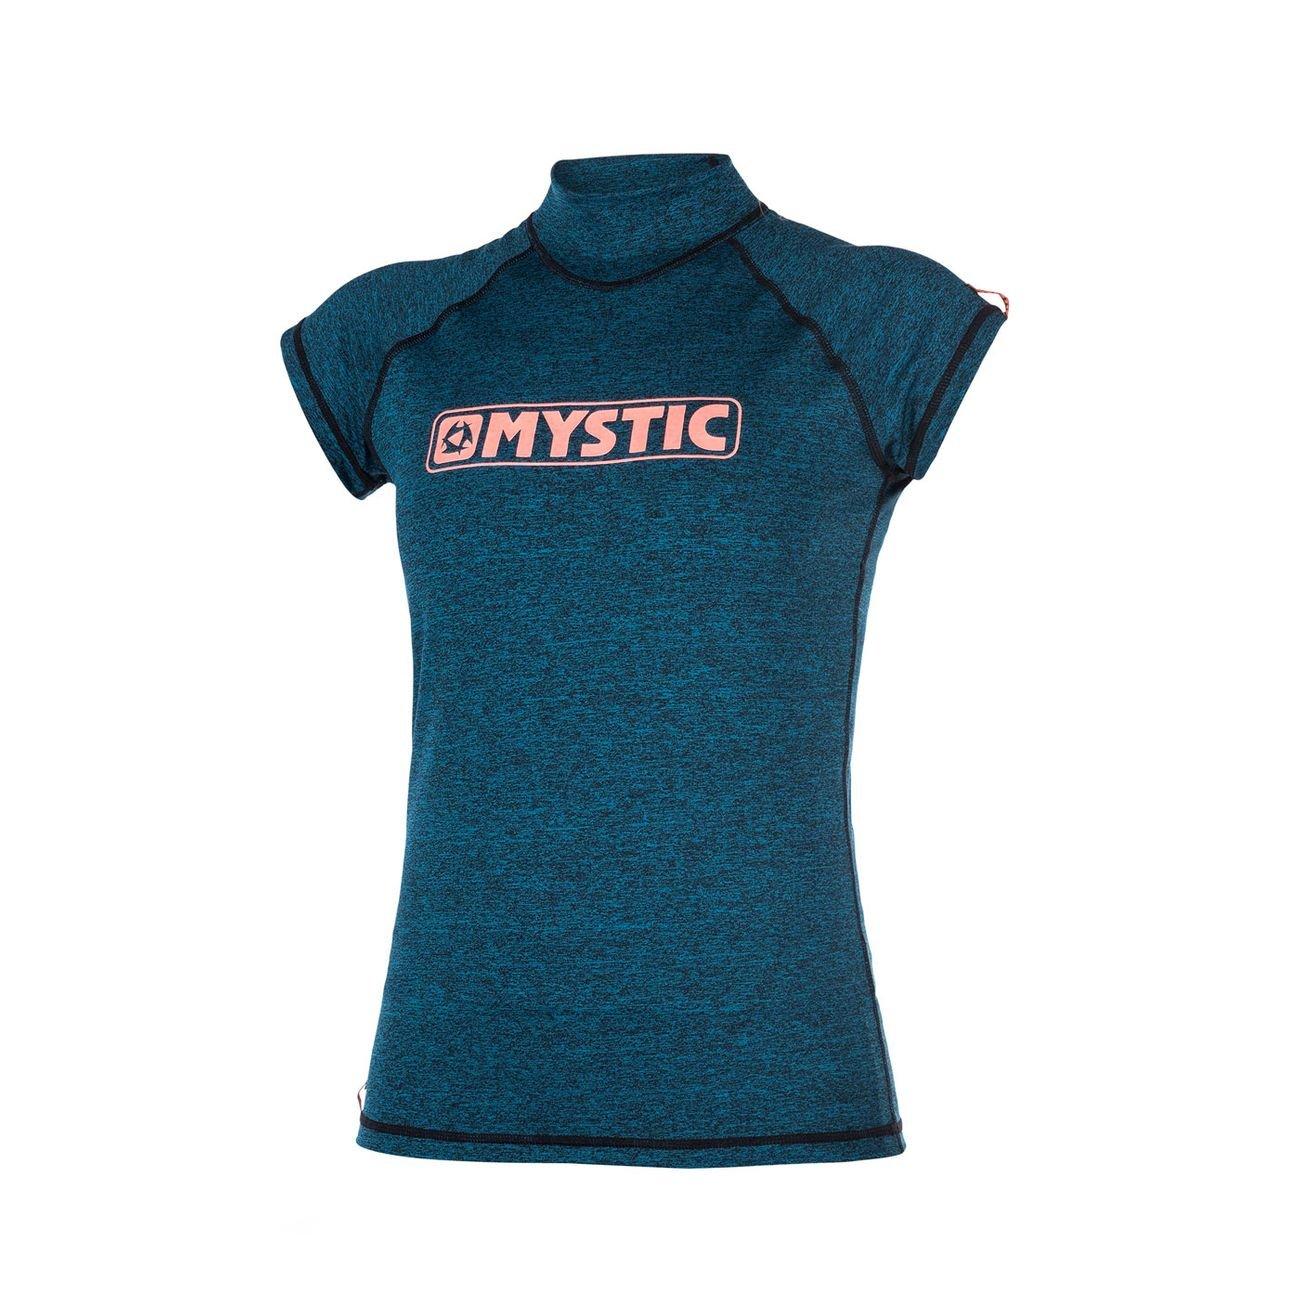 2017 Mystic Ladies Star Short Sleeve Rash Vest TEAL 170299